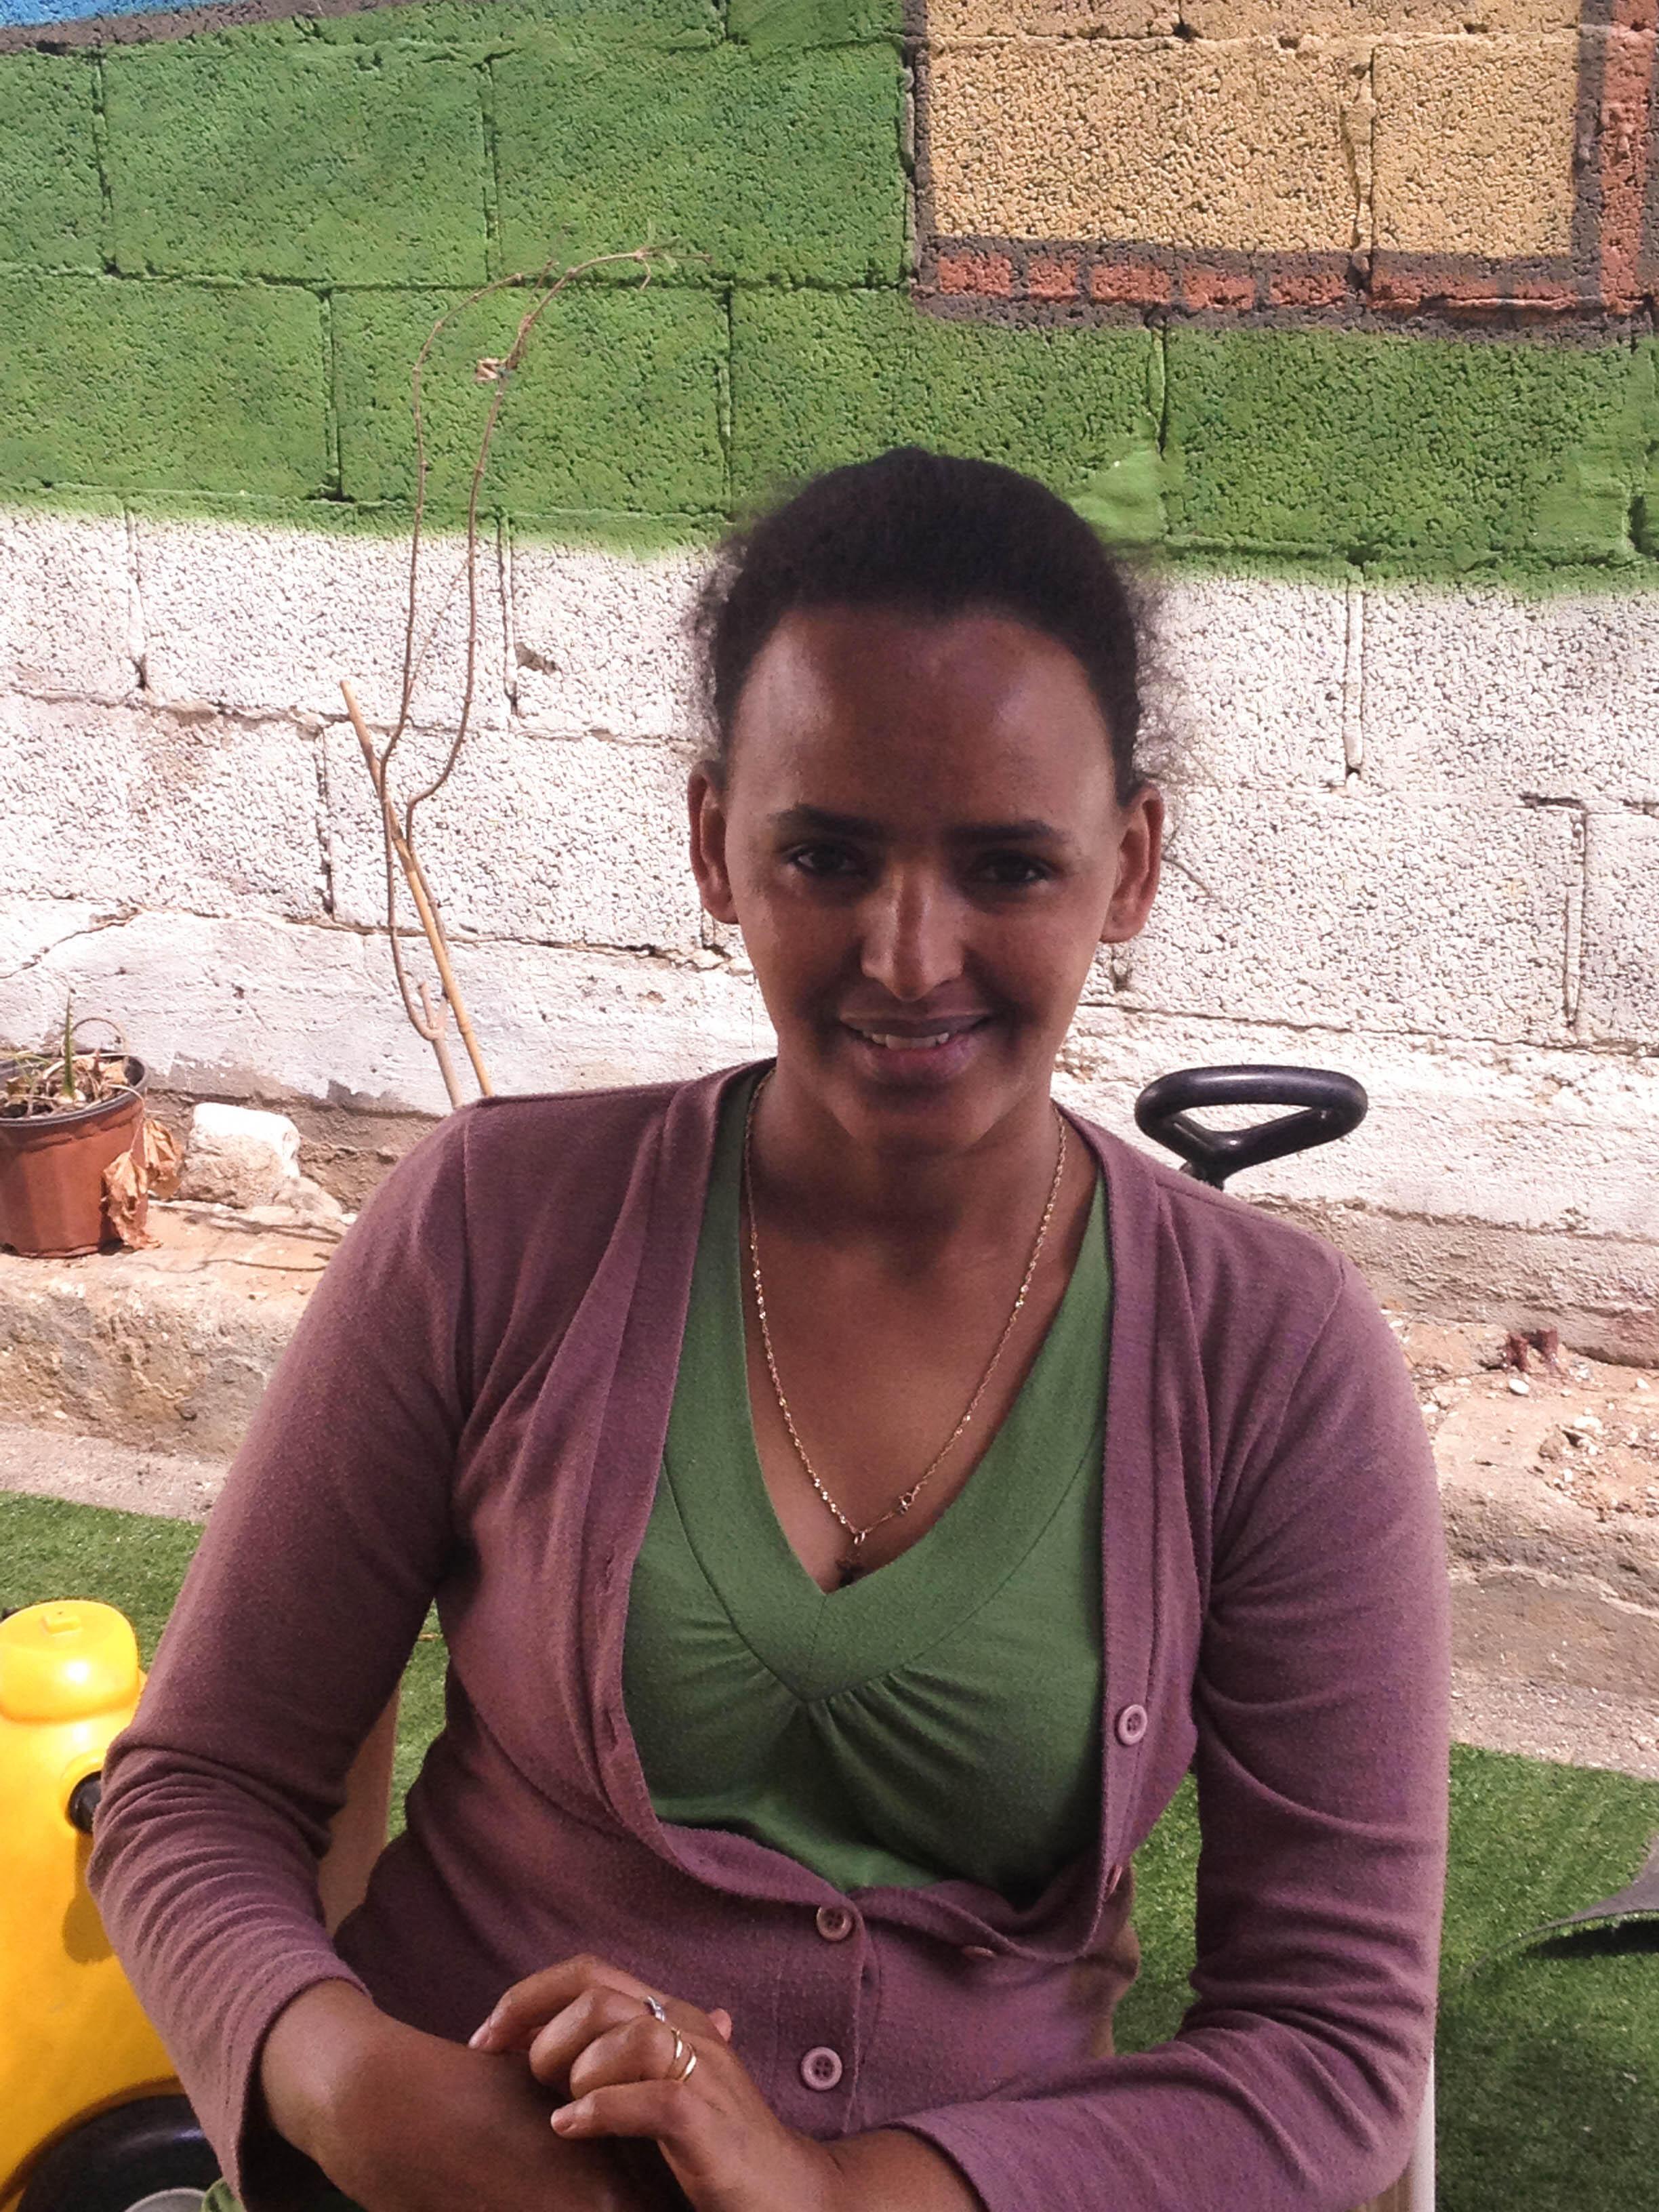 Zebib Sultan set up the Eritrean Community Women's Centre in Tel Aviv